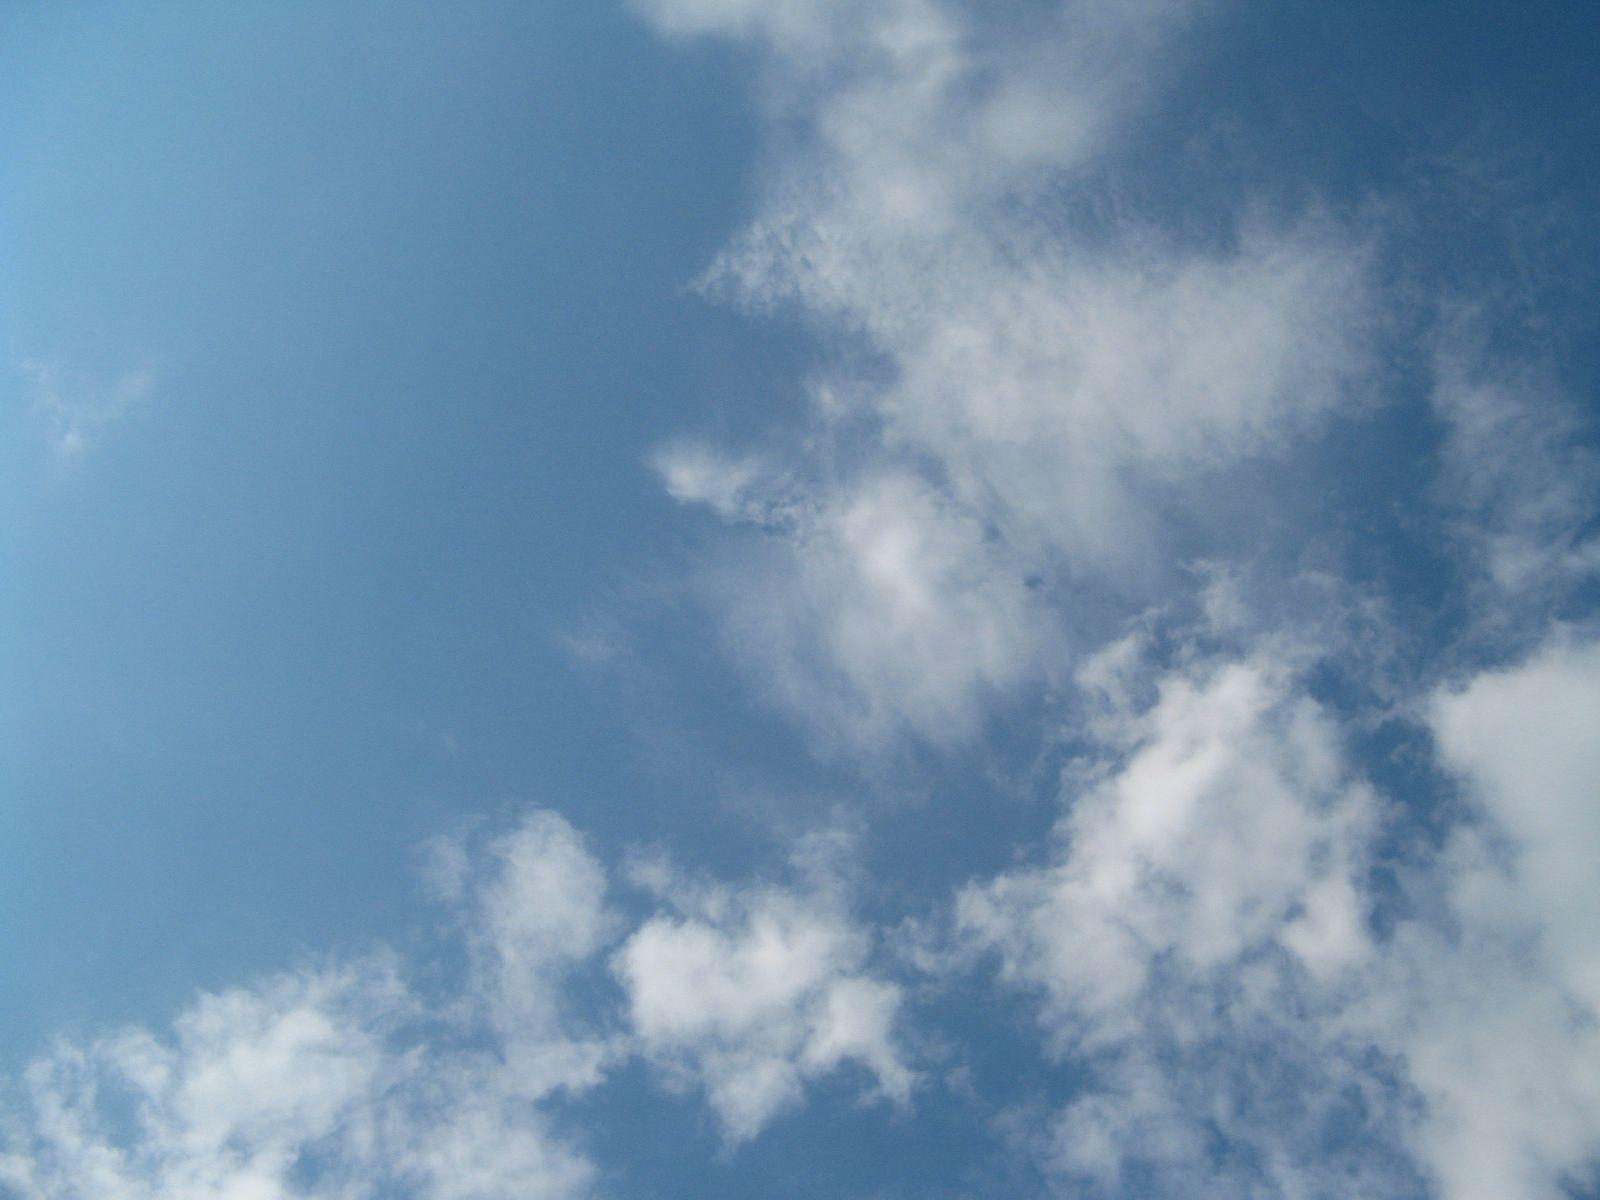 Himmel-Wolken-Foto_Textur_B_2620